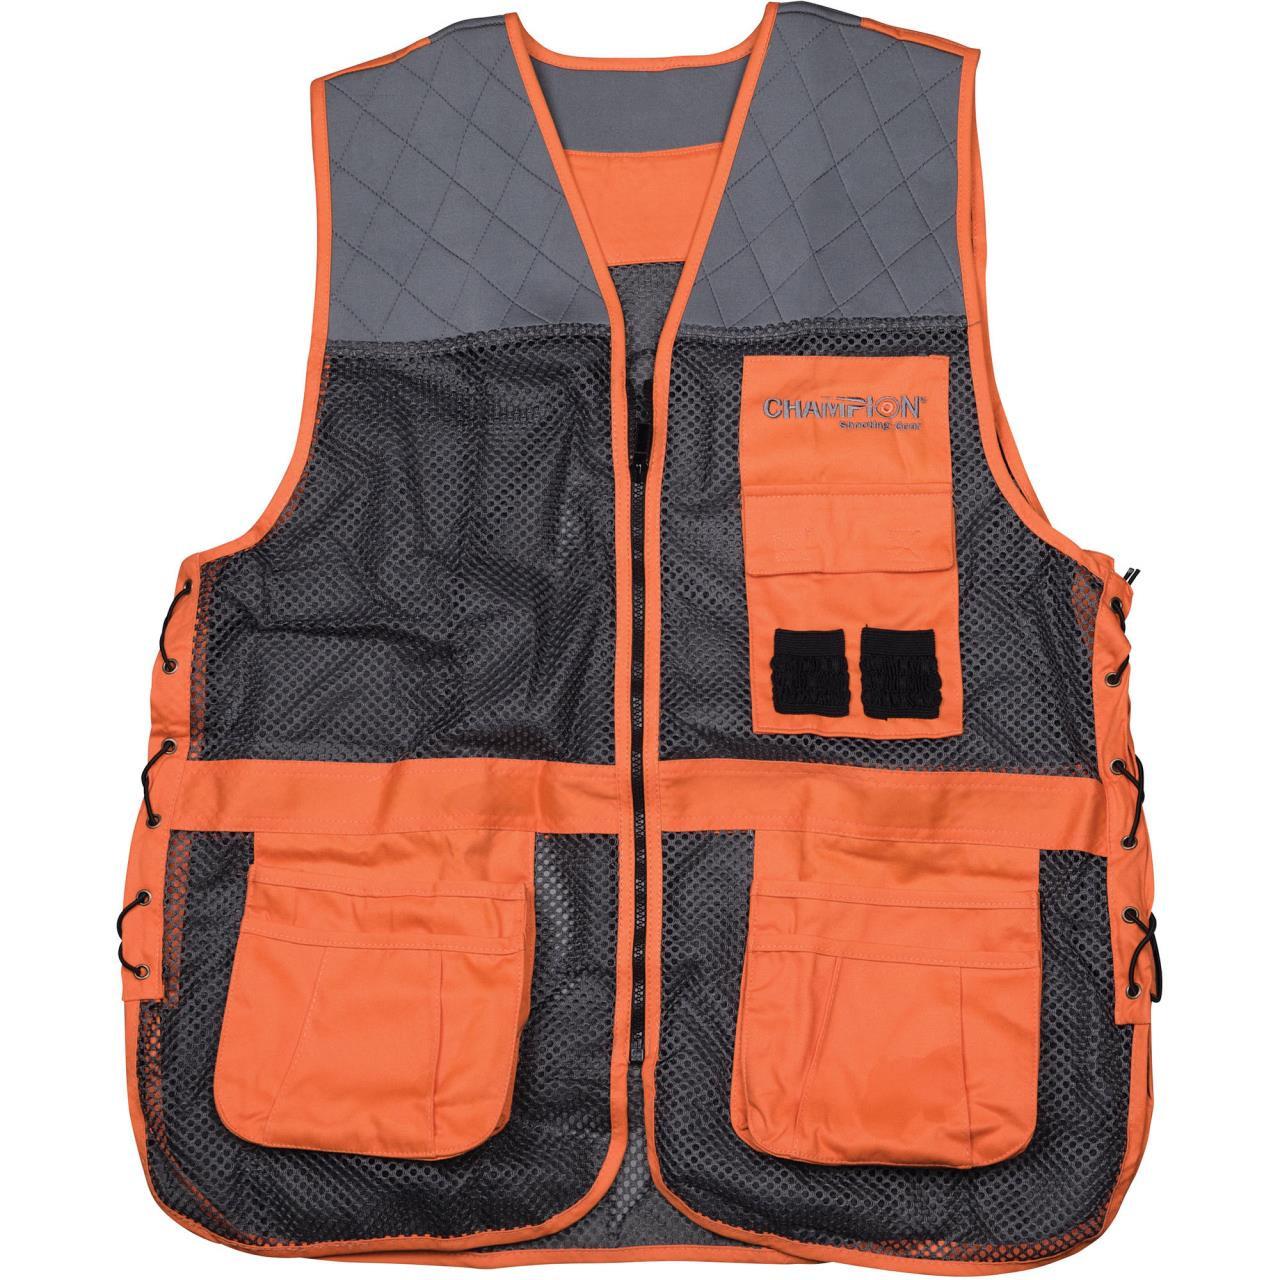 Champion Target Shooting Vest - 076683998552